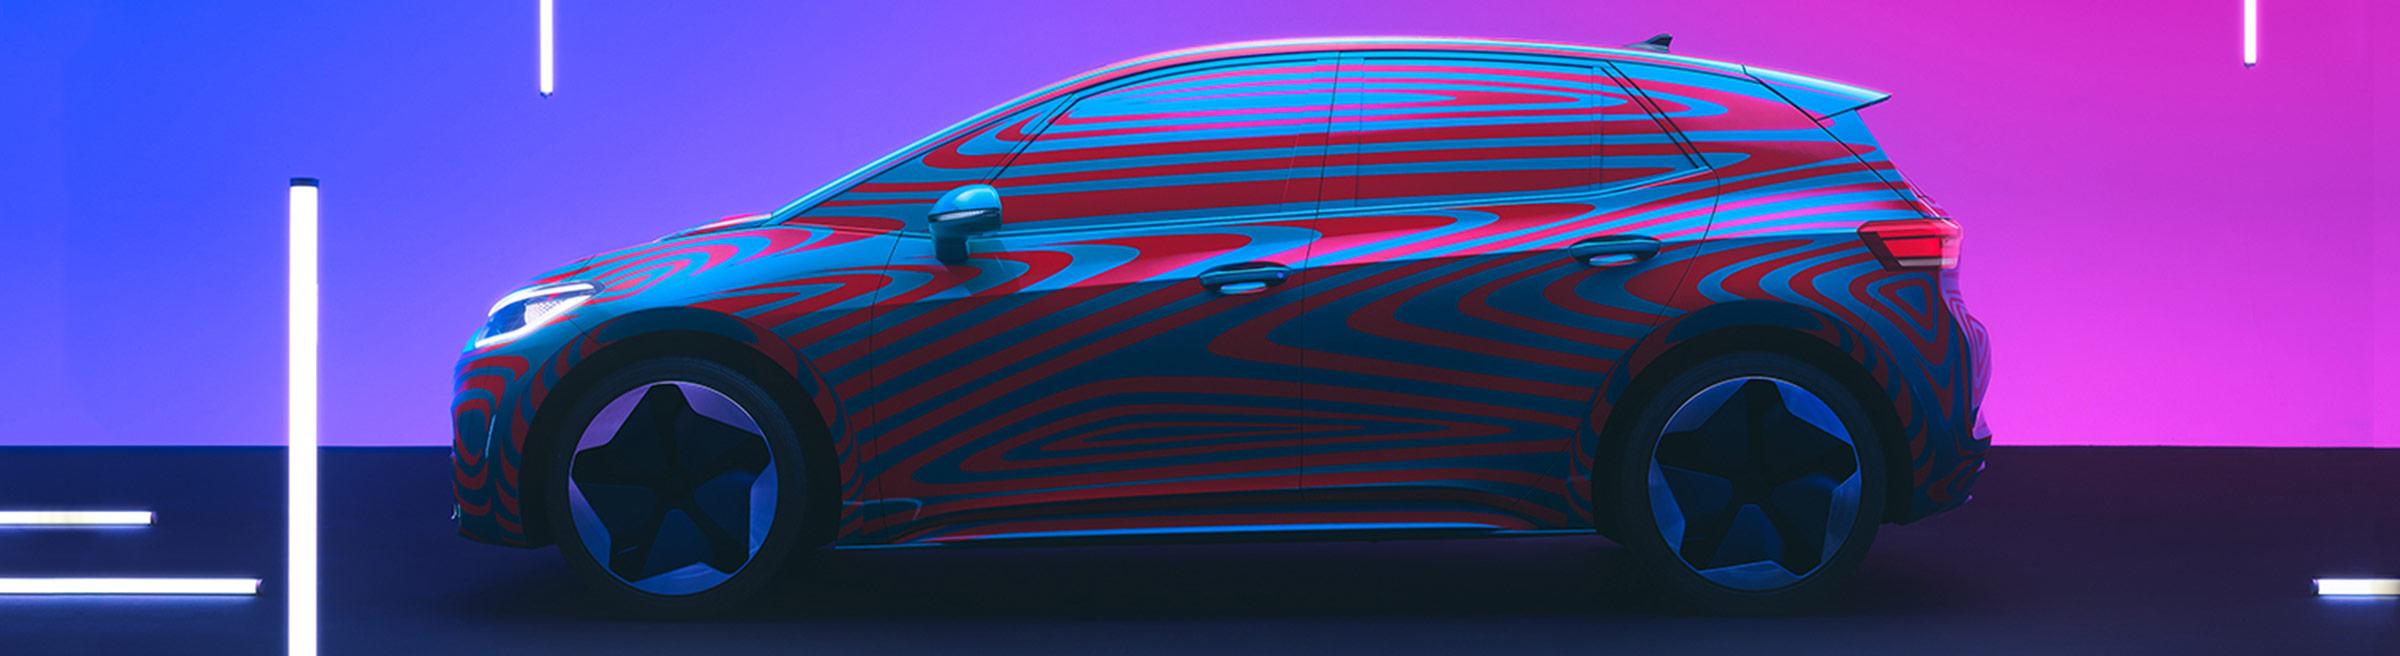 Volkswagen ID. elbil Toveks Bil